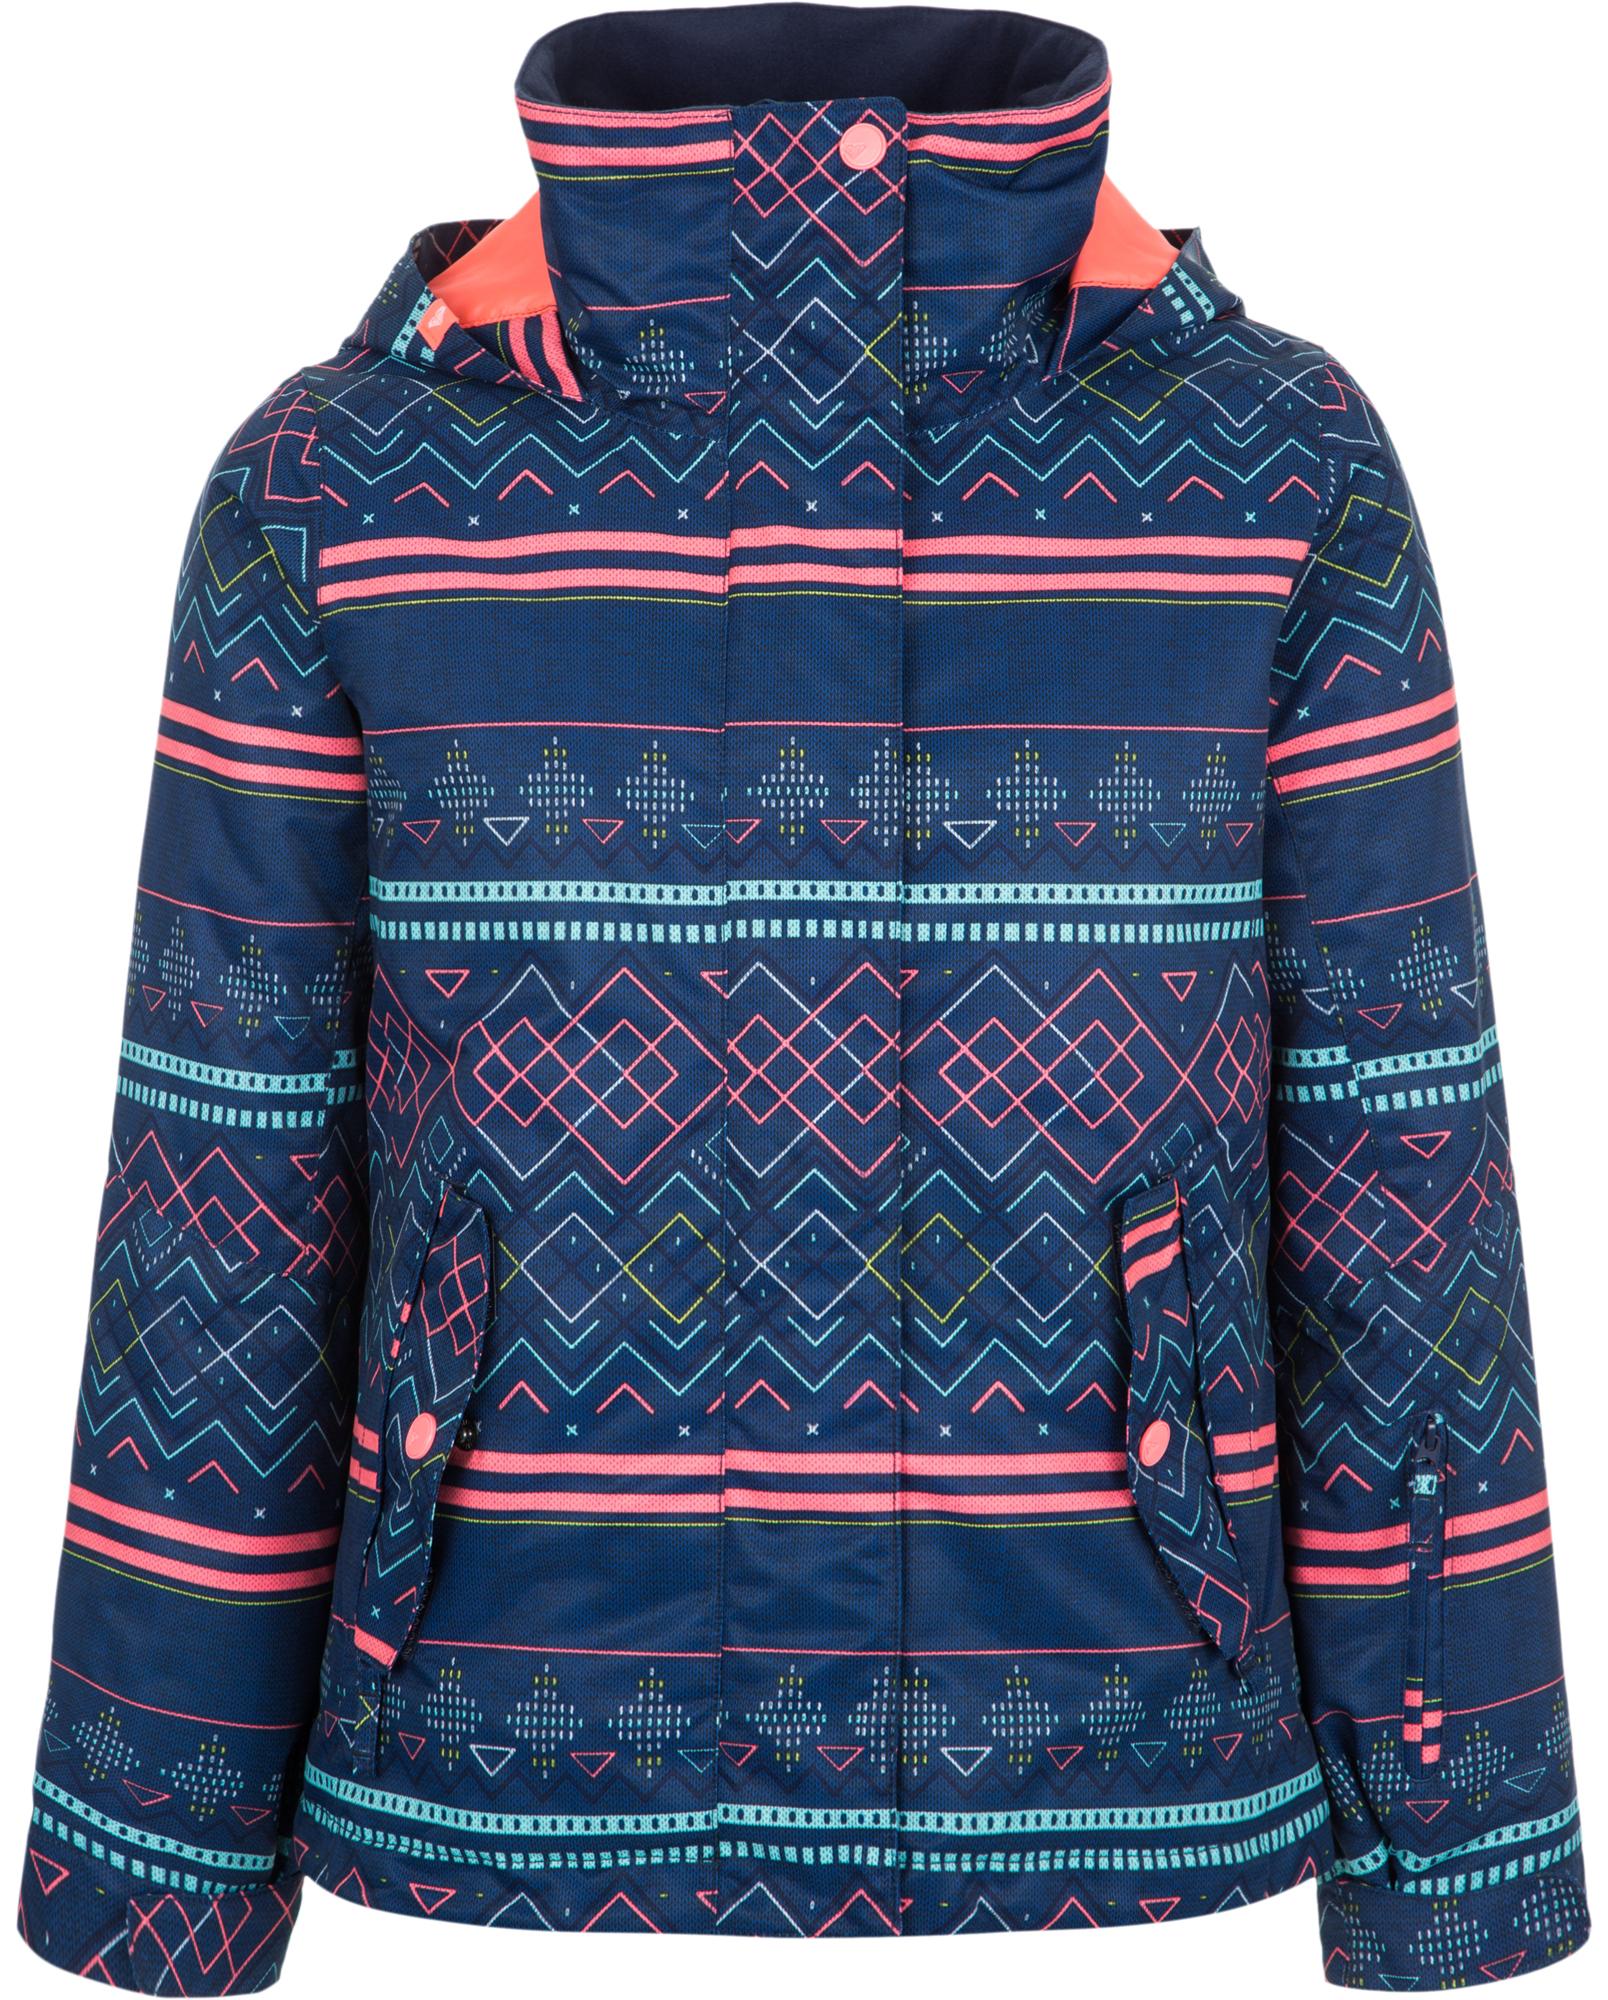 Roxy Куртка утепленная для девочек Roxy Jetty tom tailor бермуды tom tailor 640292200107548